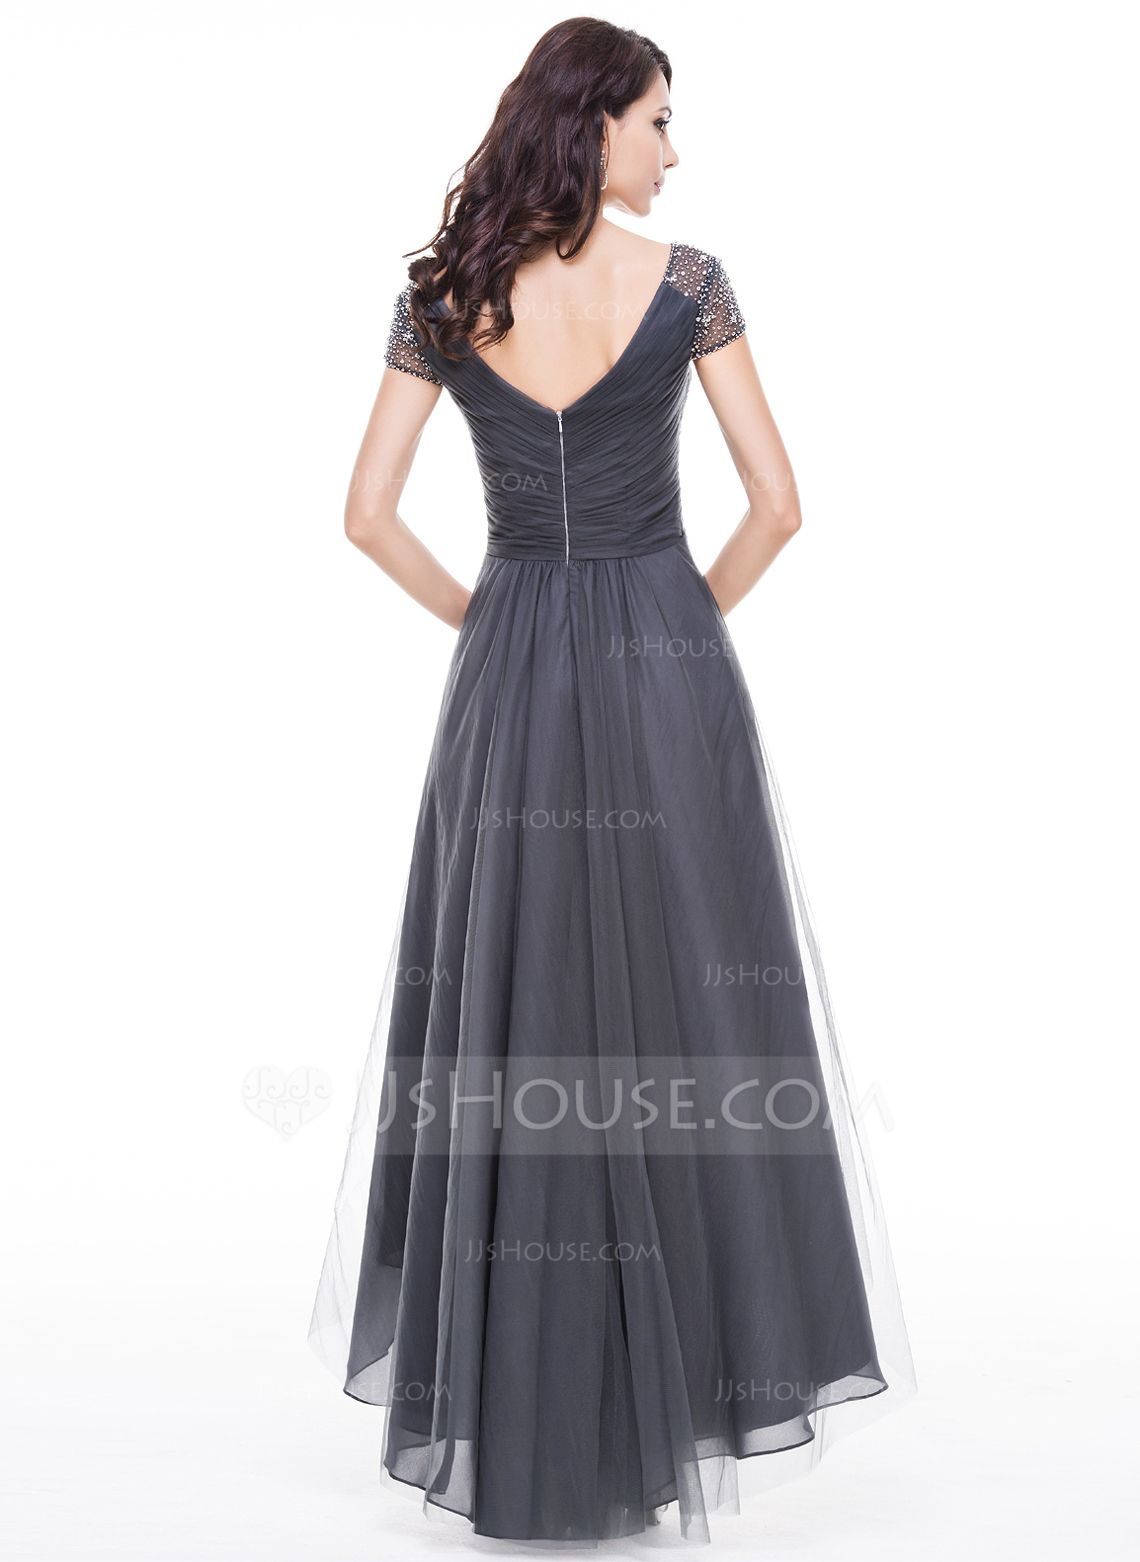 Alineprincess vneck asymmetrical tulle evening dress with ruffle